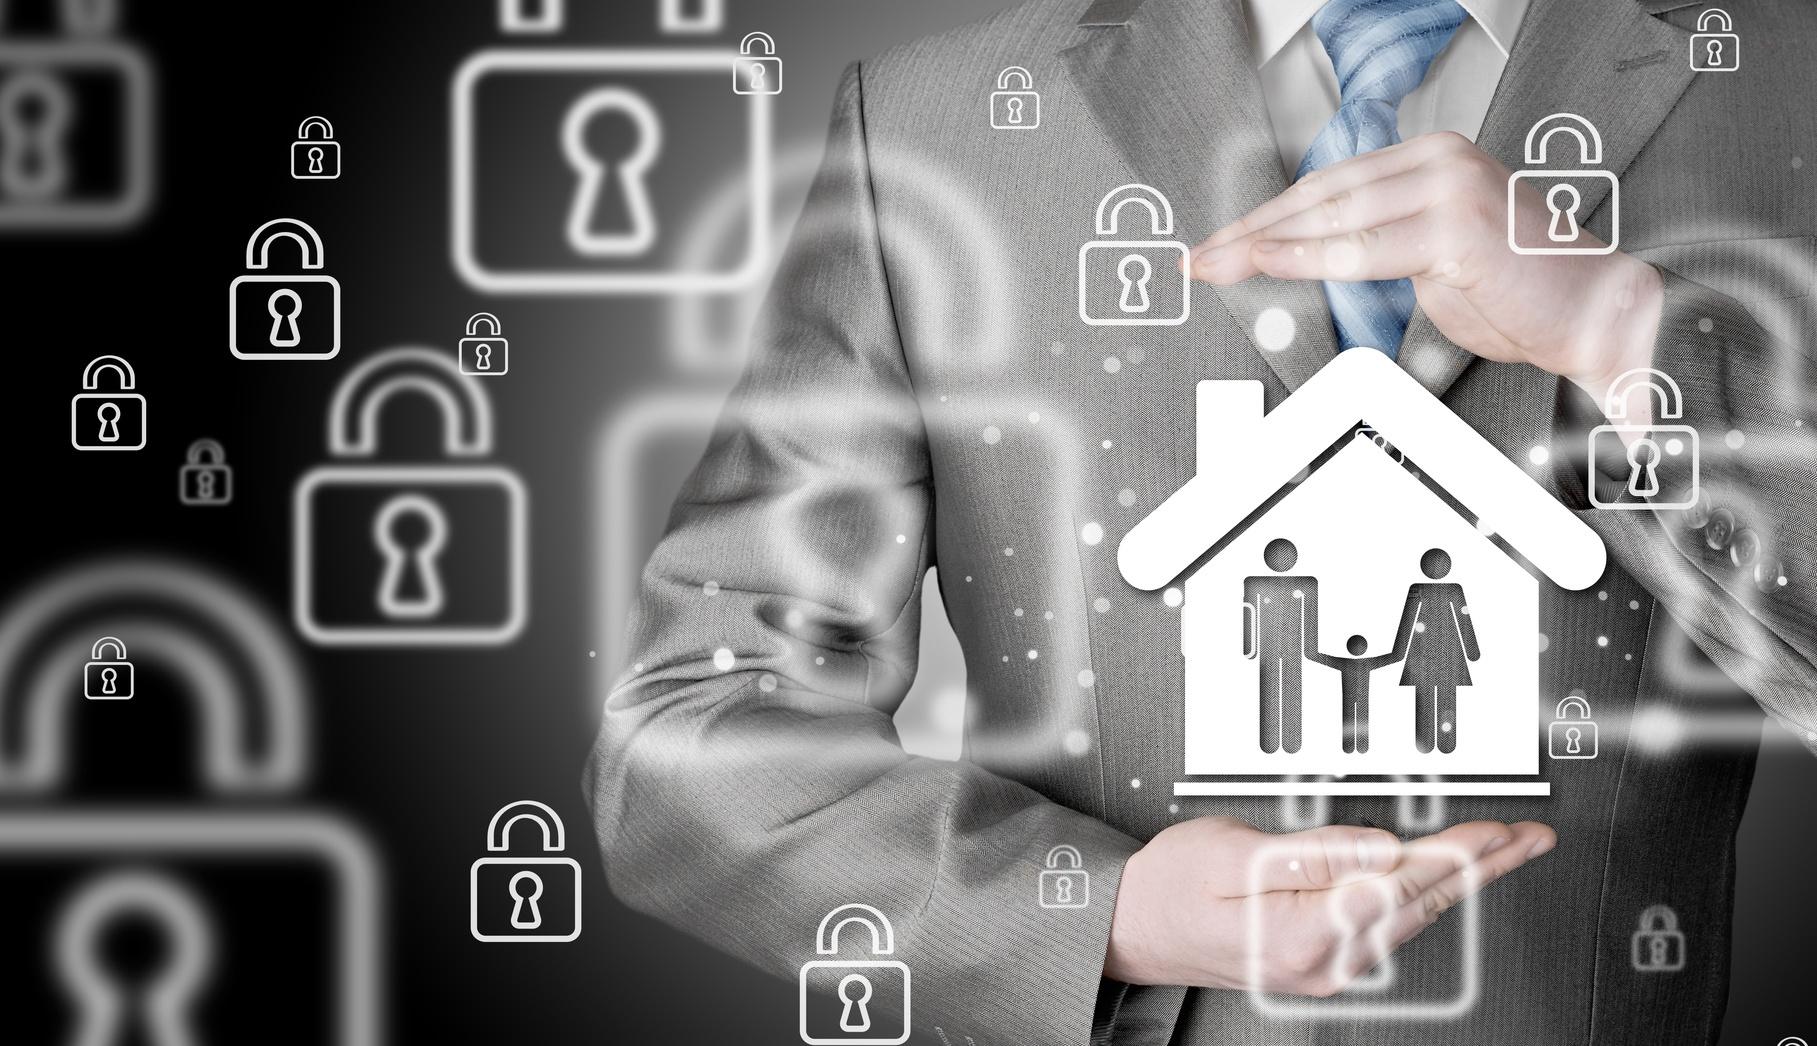 prevent-property-theft.jpg